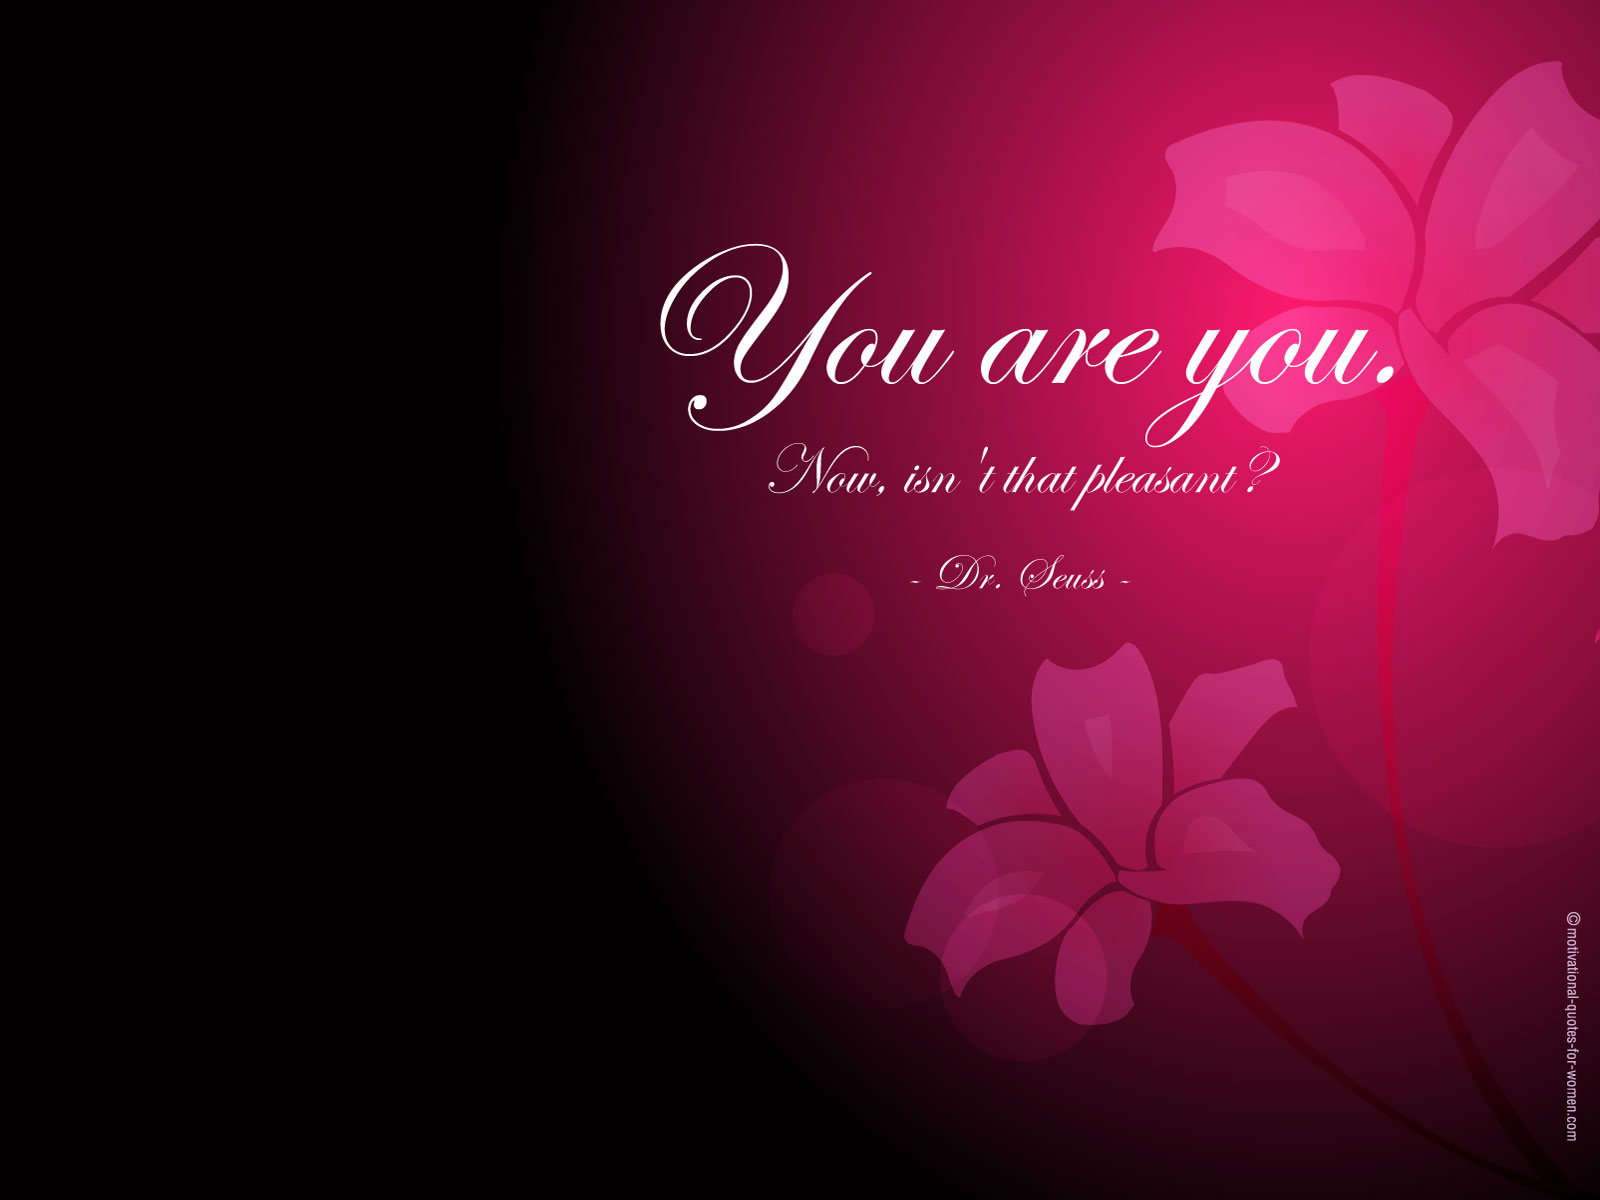 free wallpicz Desktop Wallpaper Inspirational Quotes 1600x1200